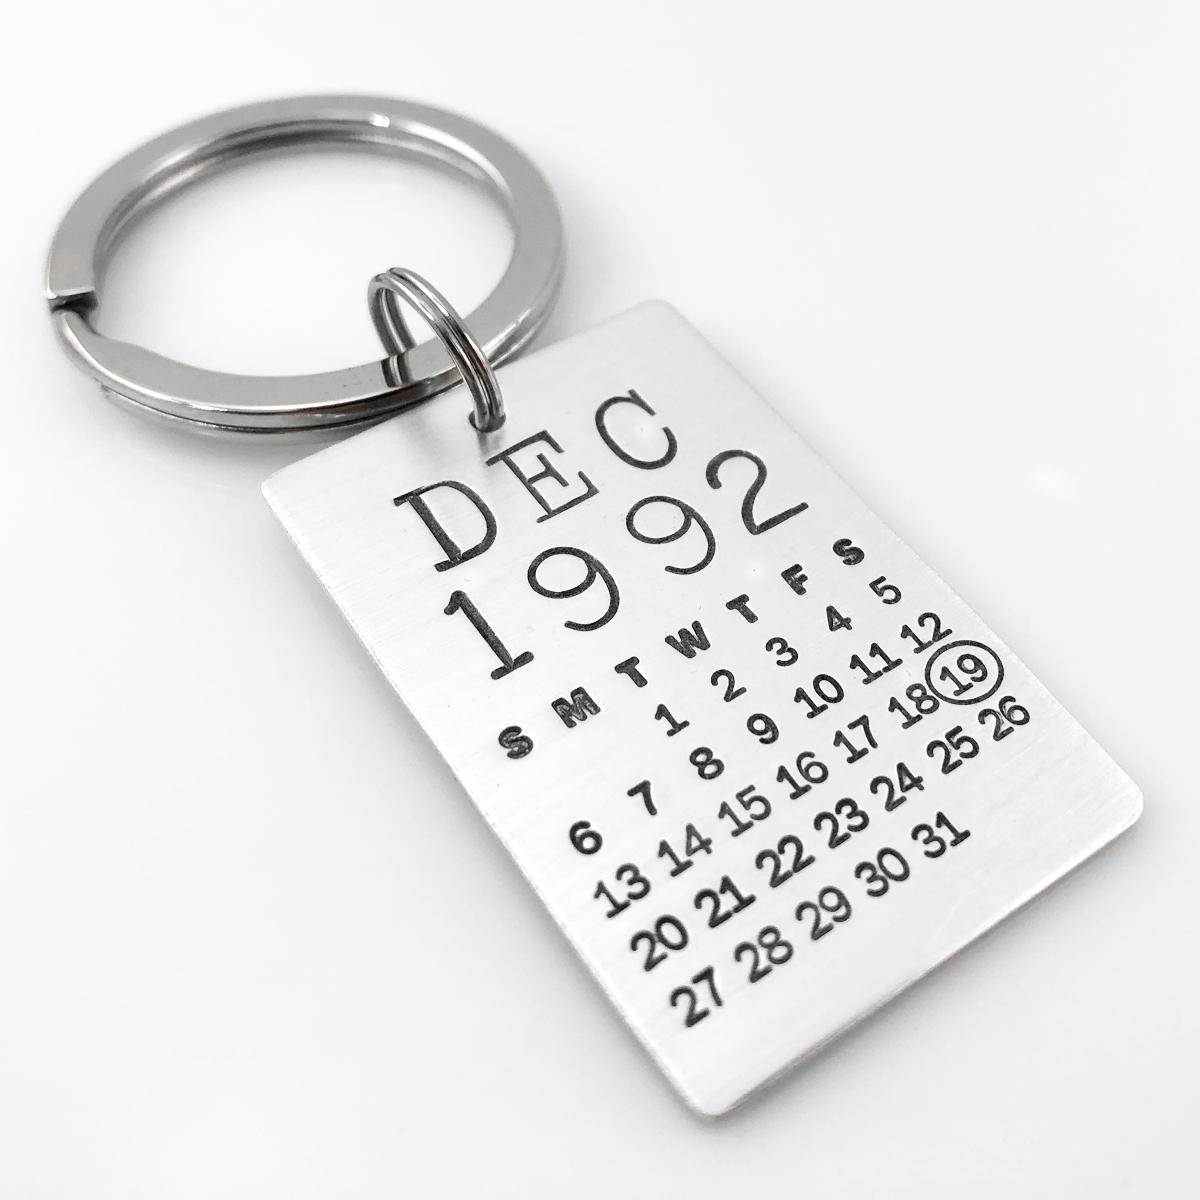 Mark Your Calendar Key Chain - larger